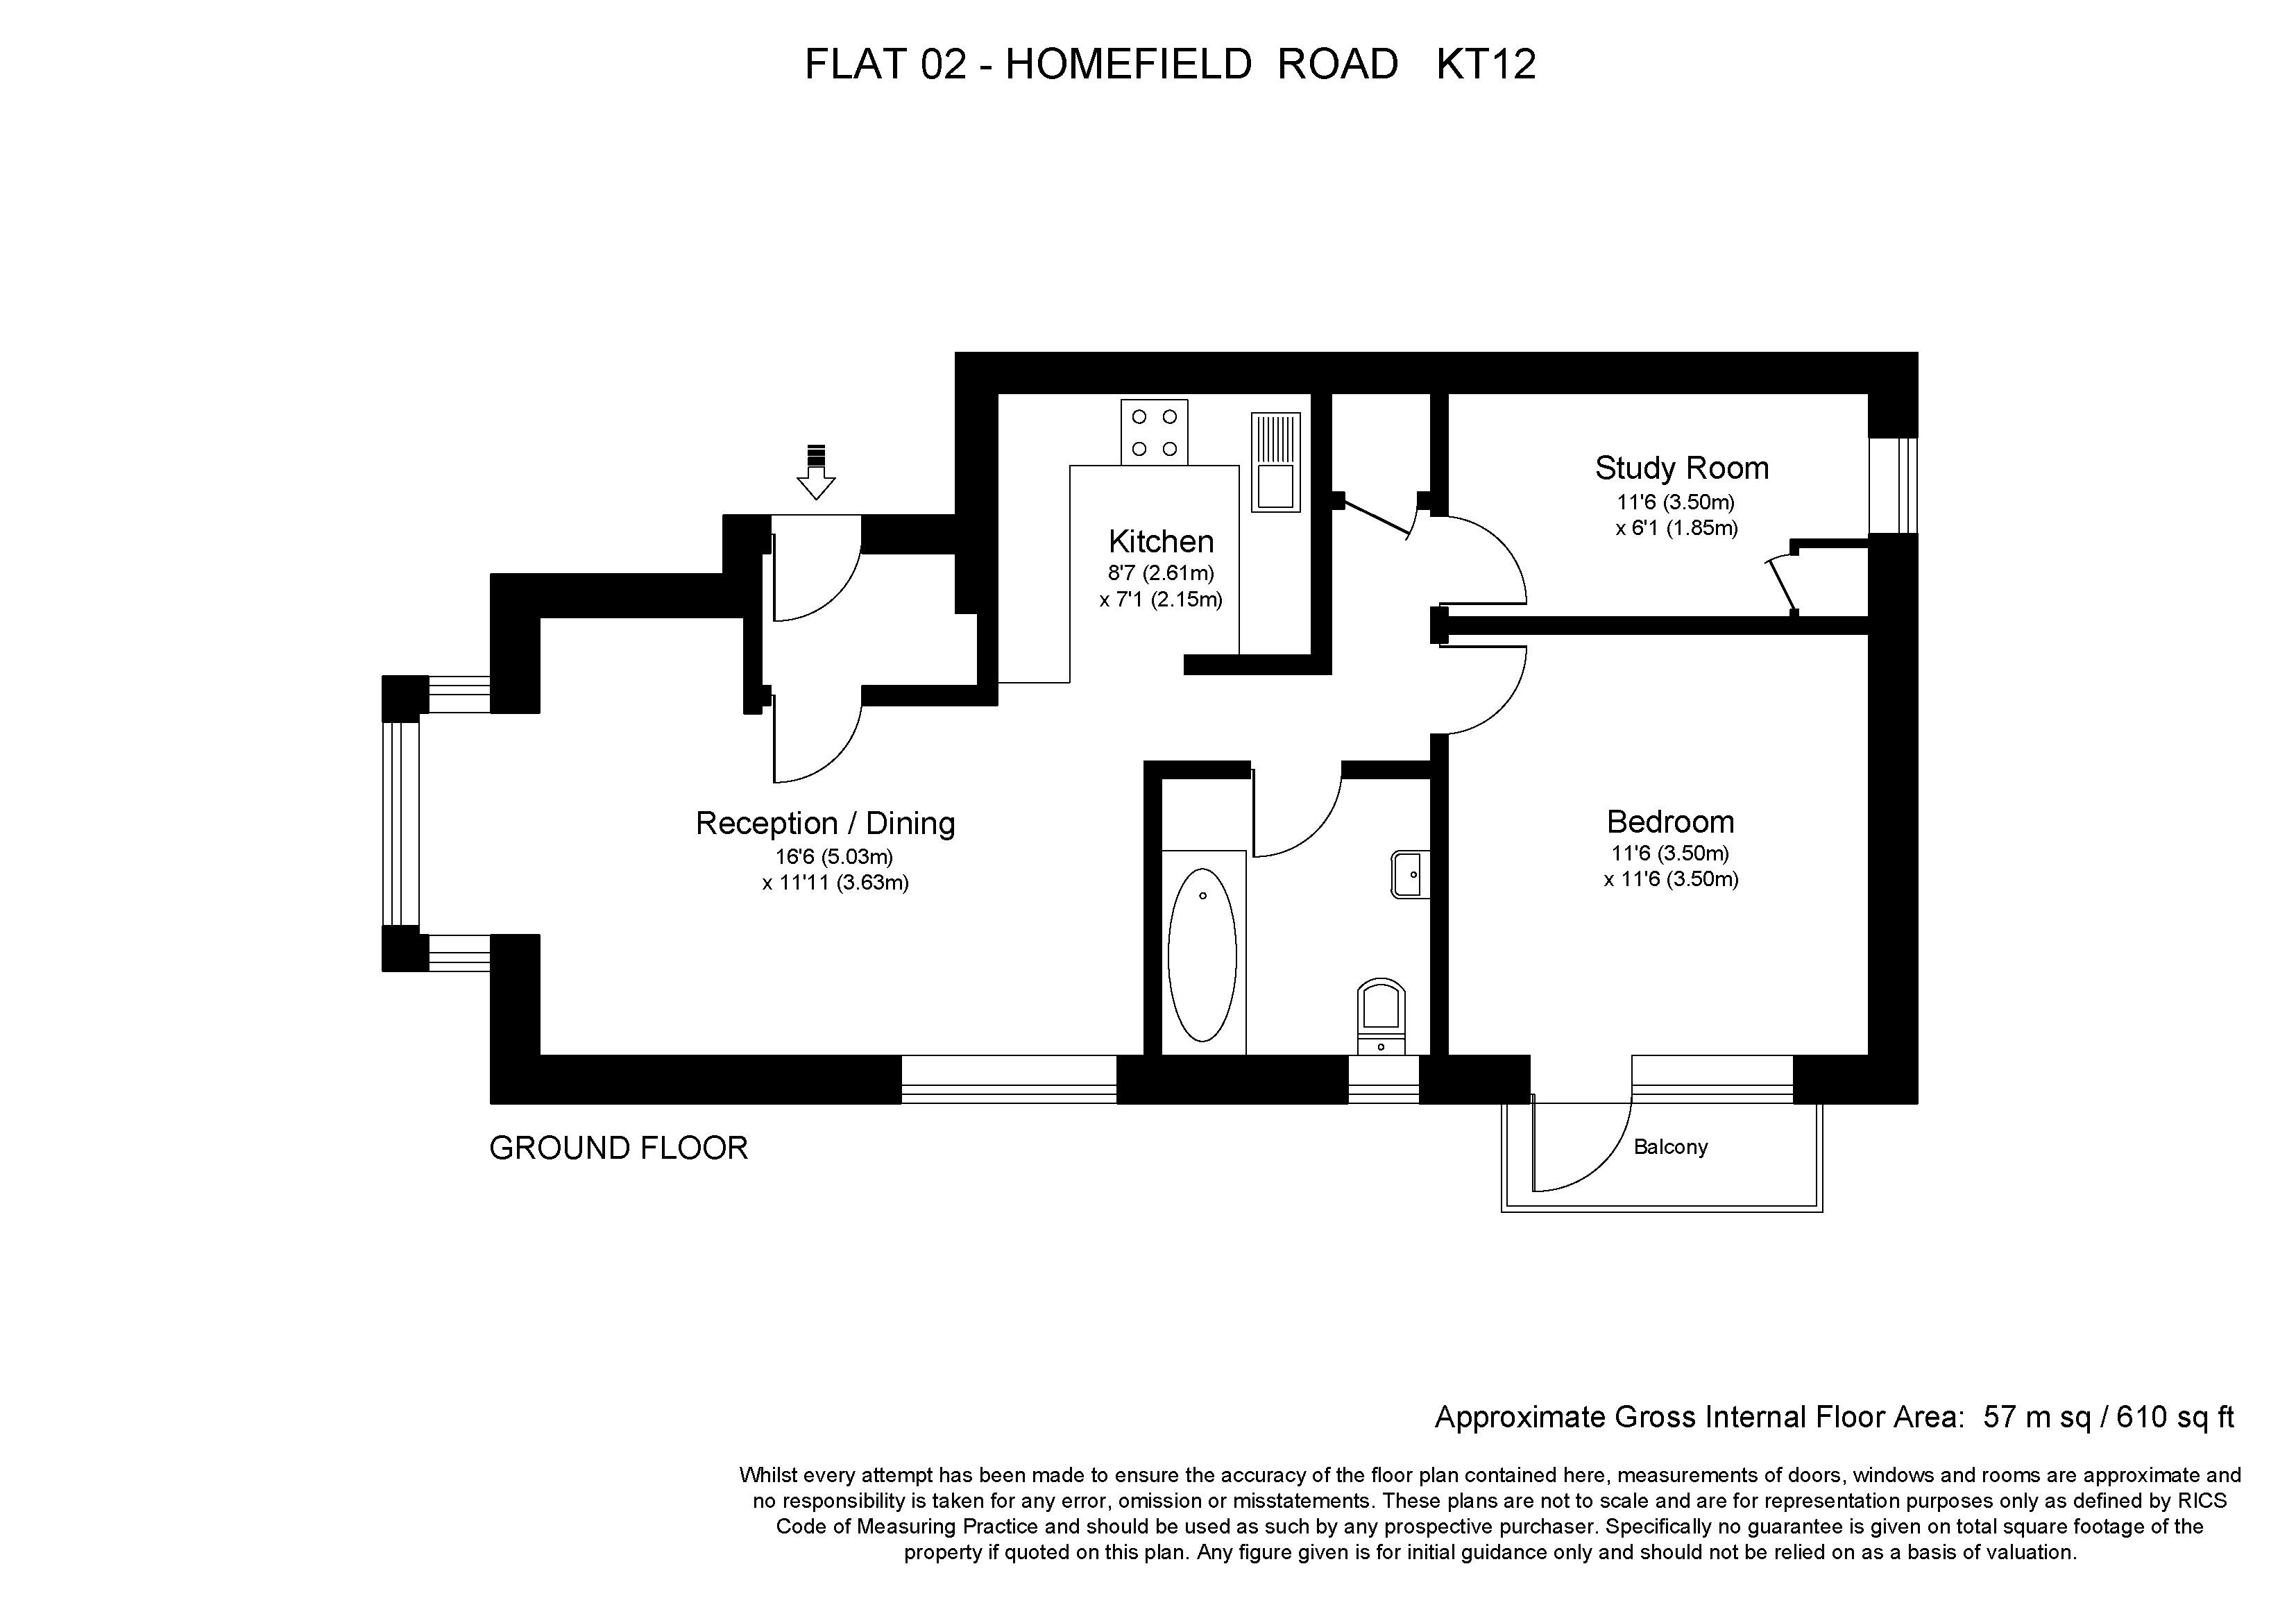 42 Homefield Road